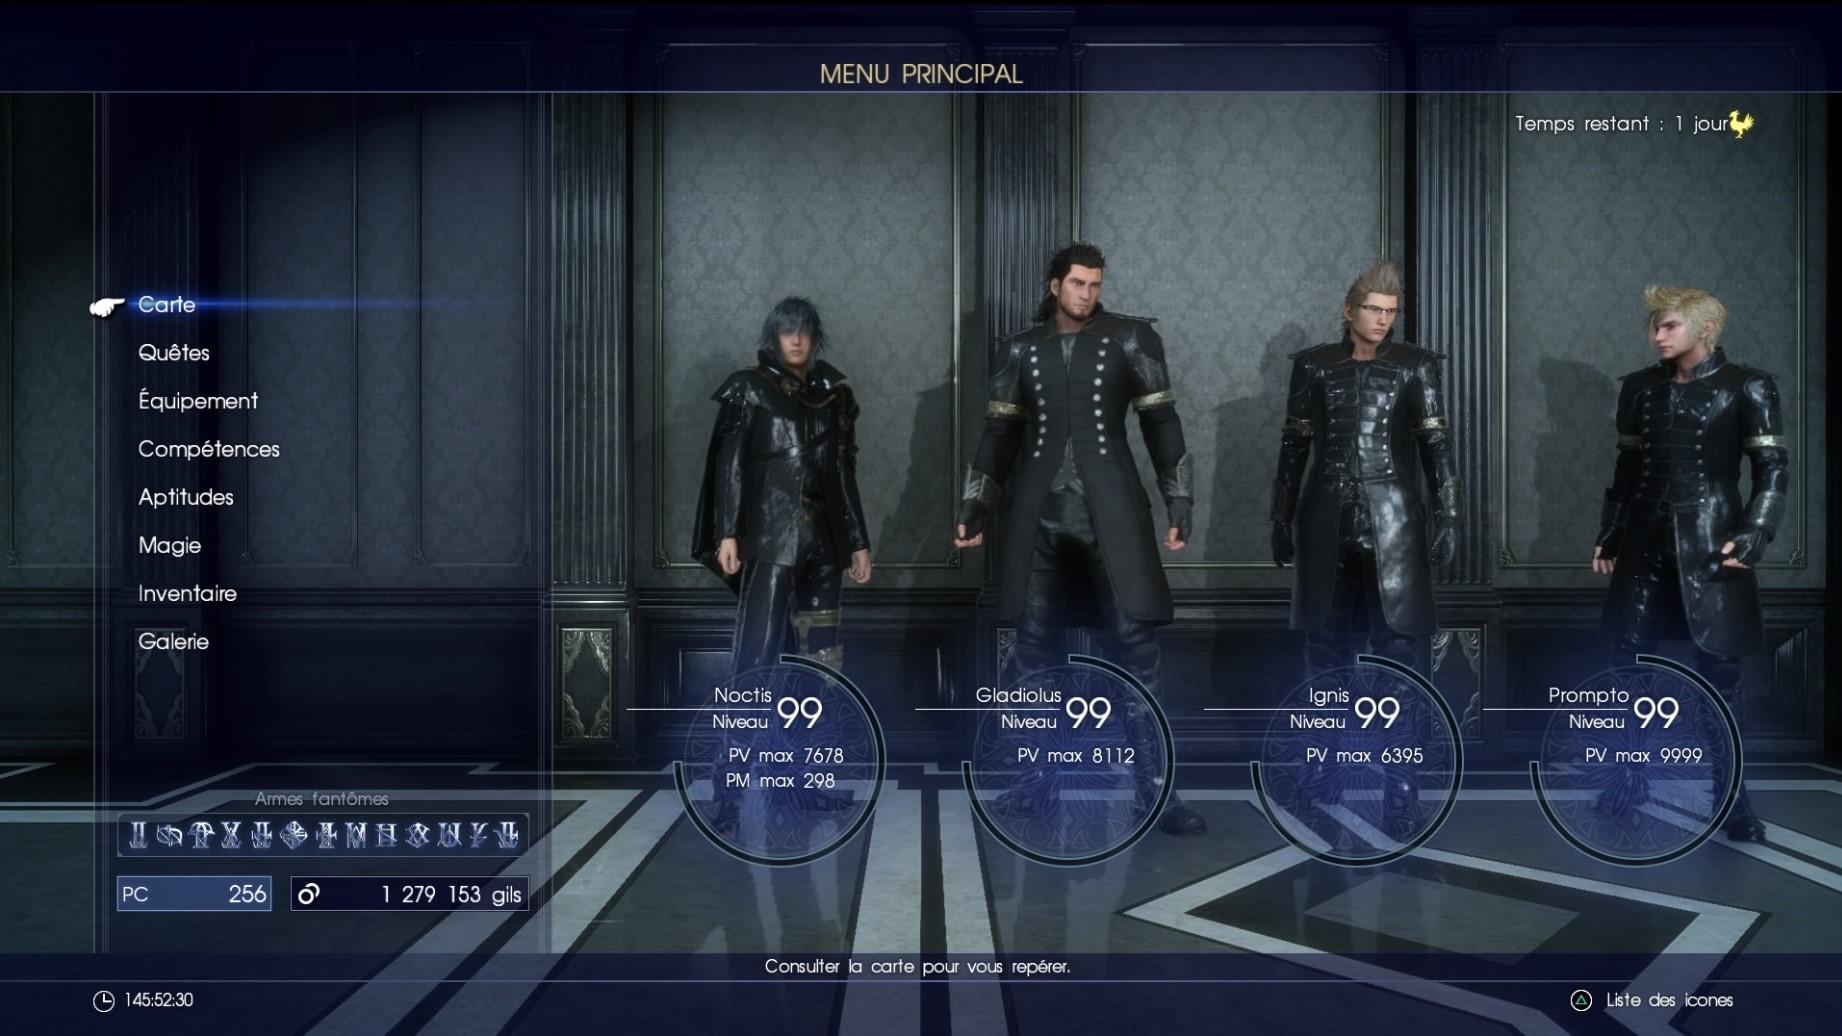 Final Fantasy XV level 99